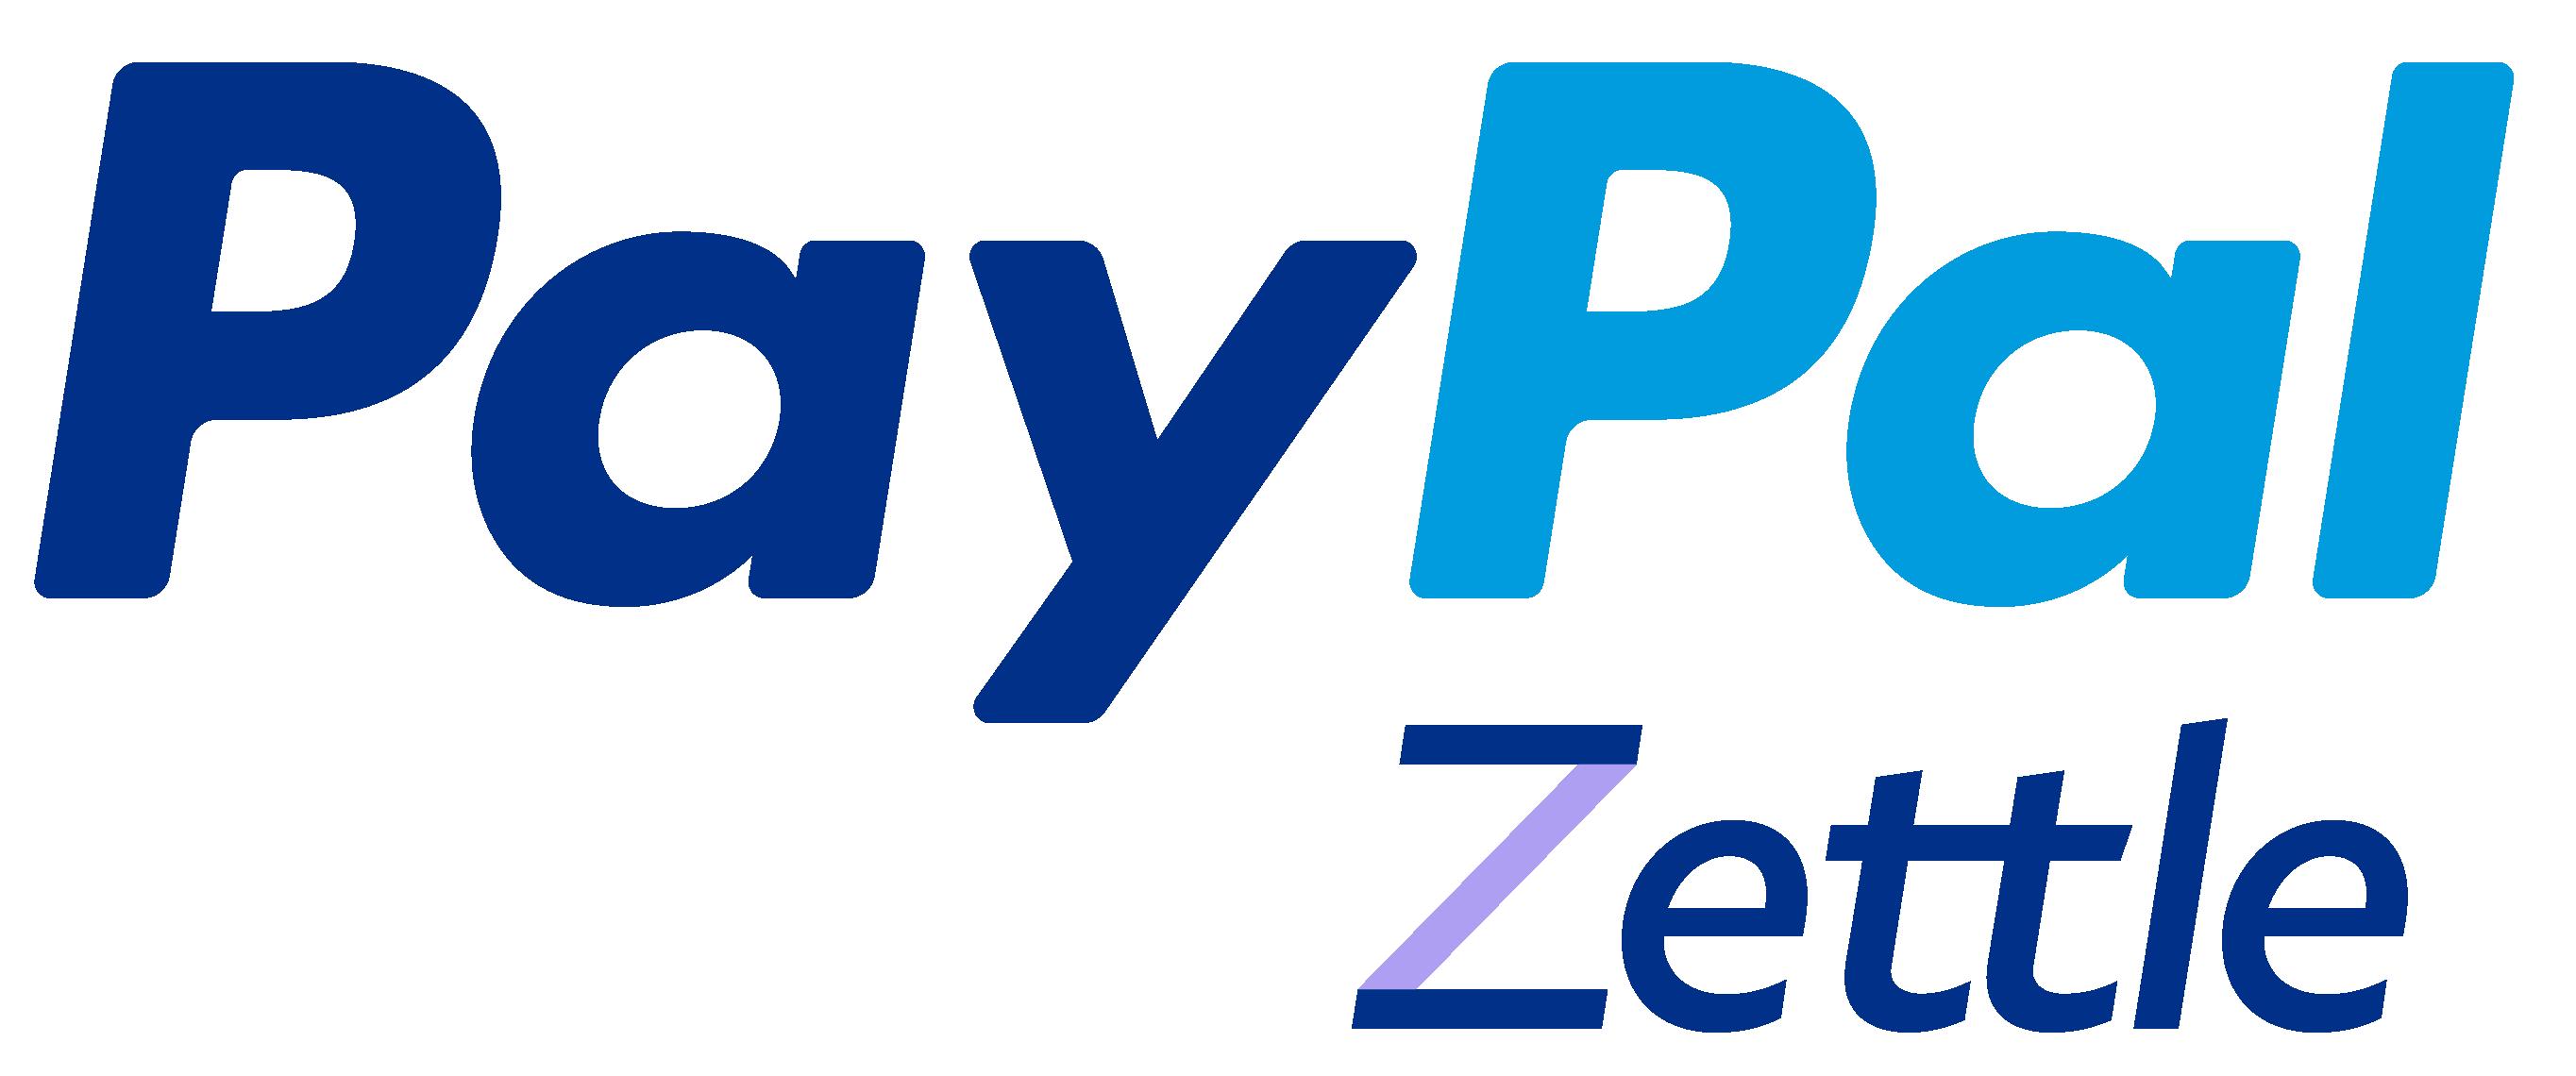 PayPal Zettle logo